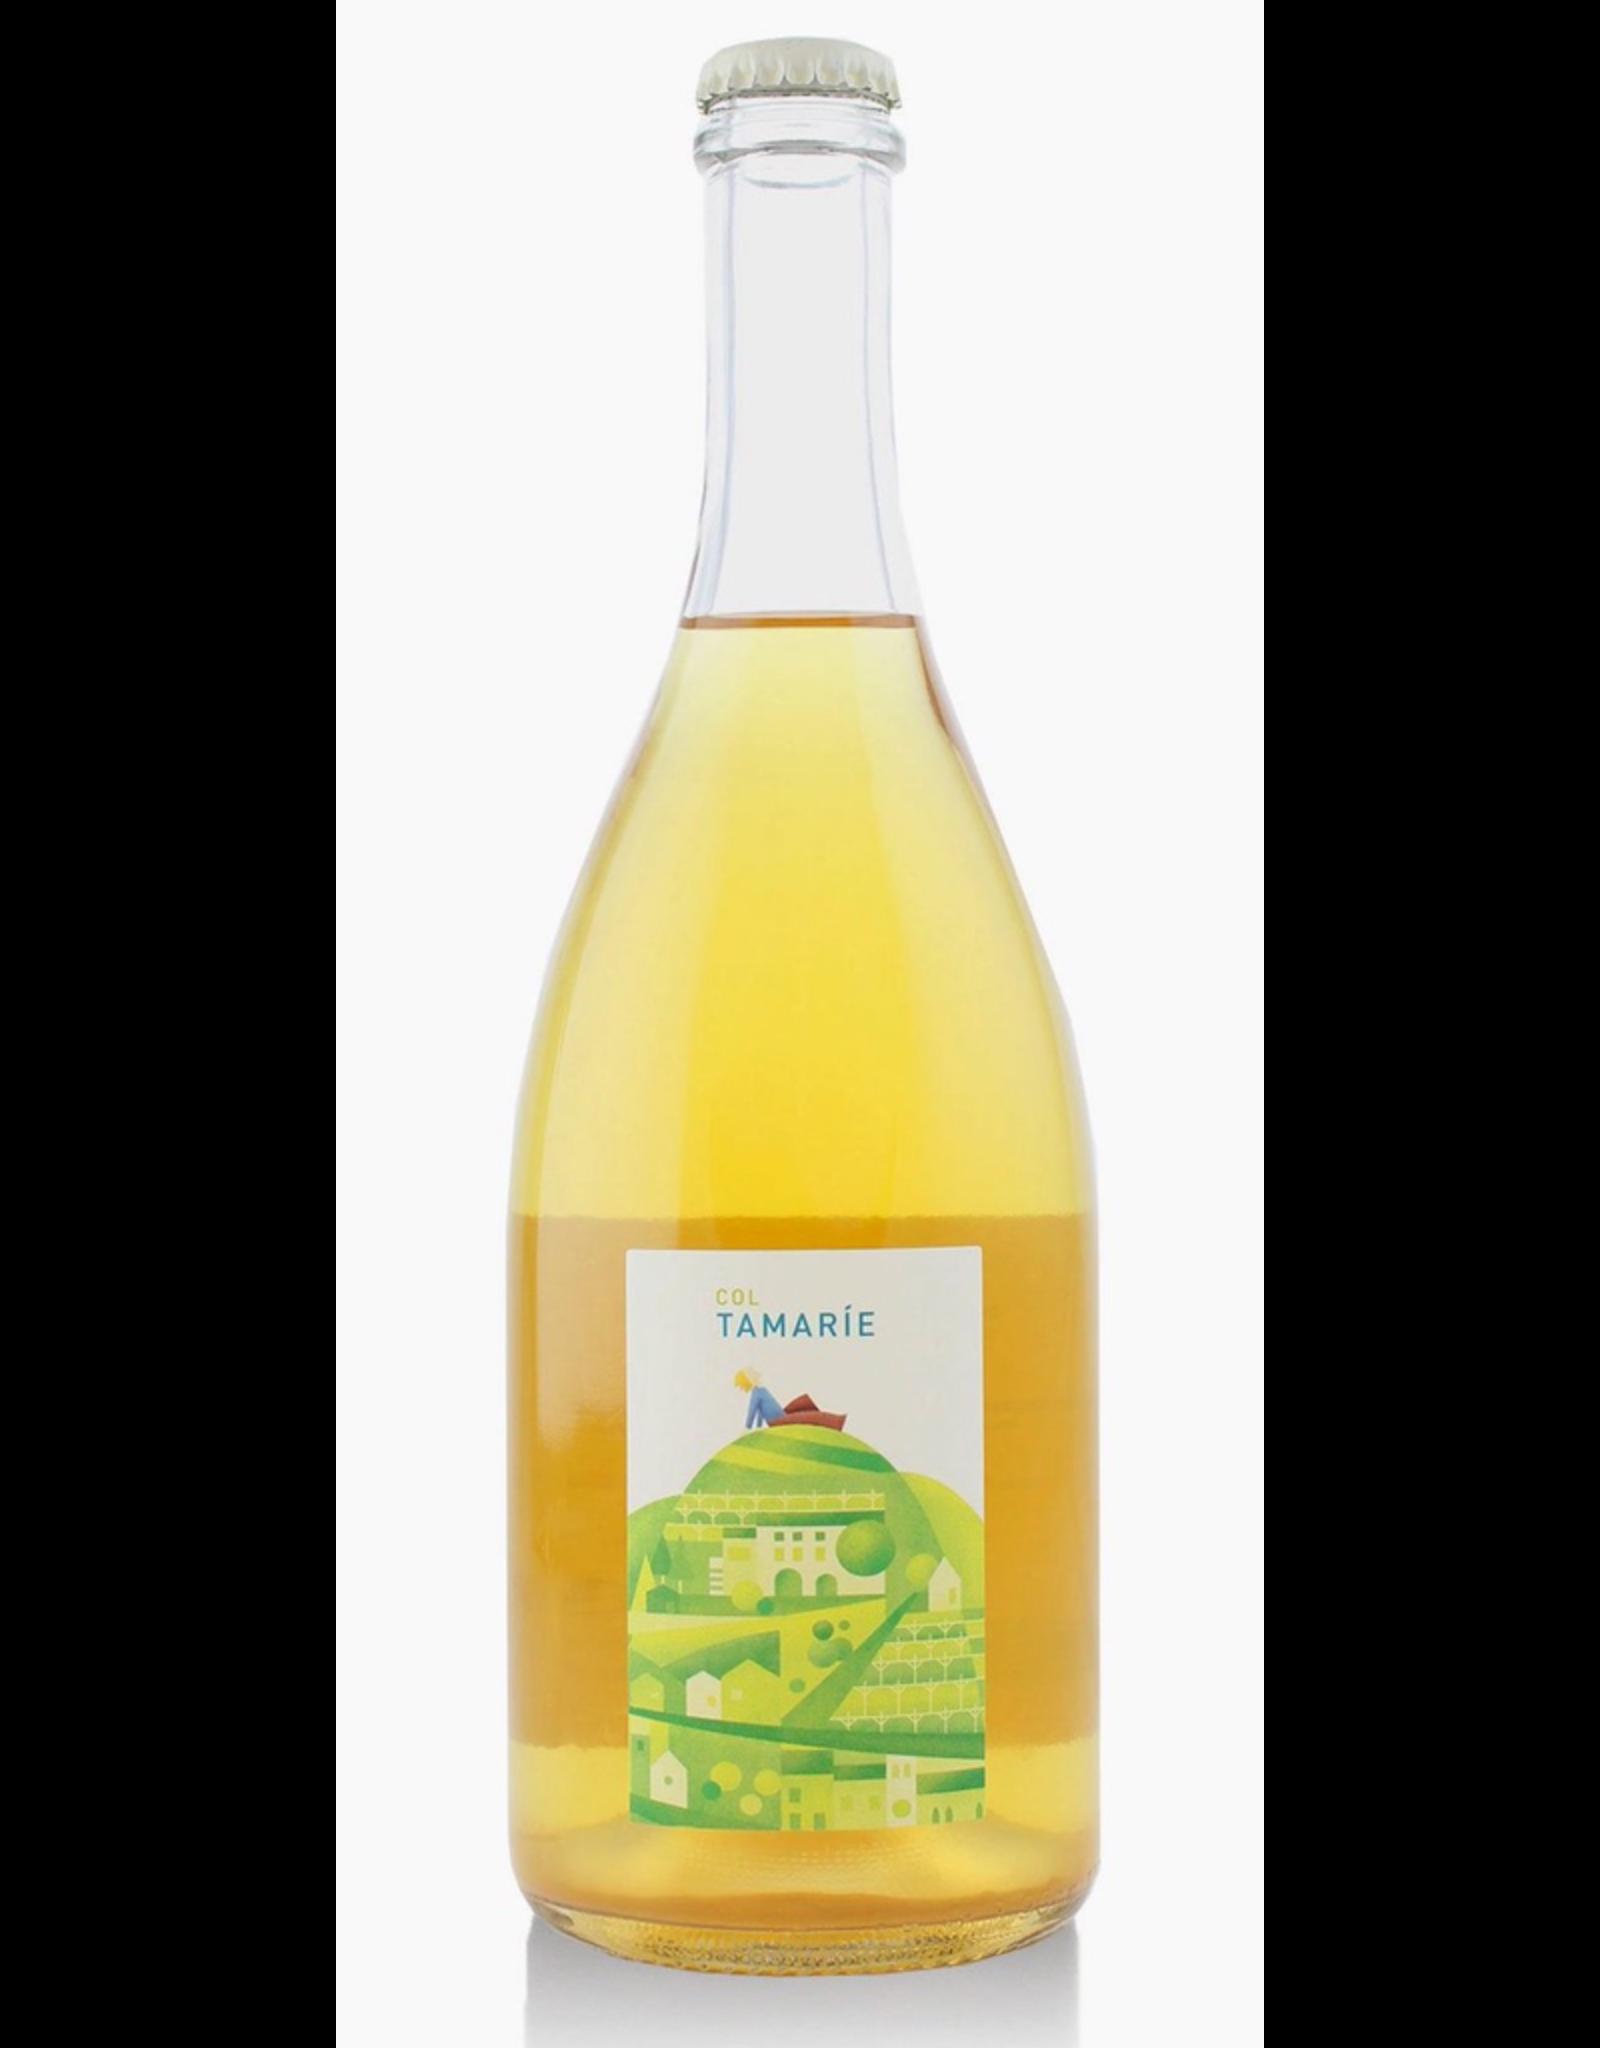 White Wine 2017, Col Tamarie by Vigna San Lorenzo, Rare White PET-Nat, Glera, Boschera Perera Bianchetta Grapariol Verdiso Marzemina Bianca, Venezie, Veneto, Italy, 11.5% Alc, CT93